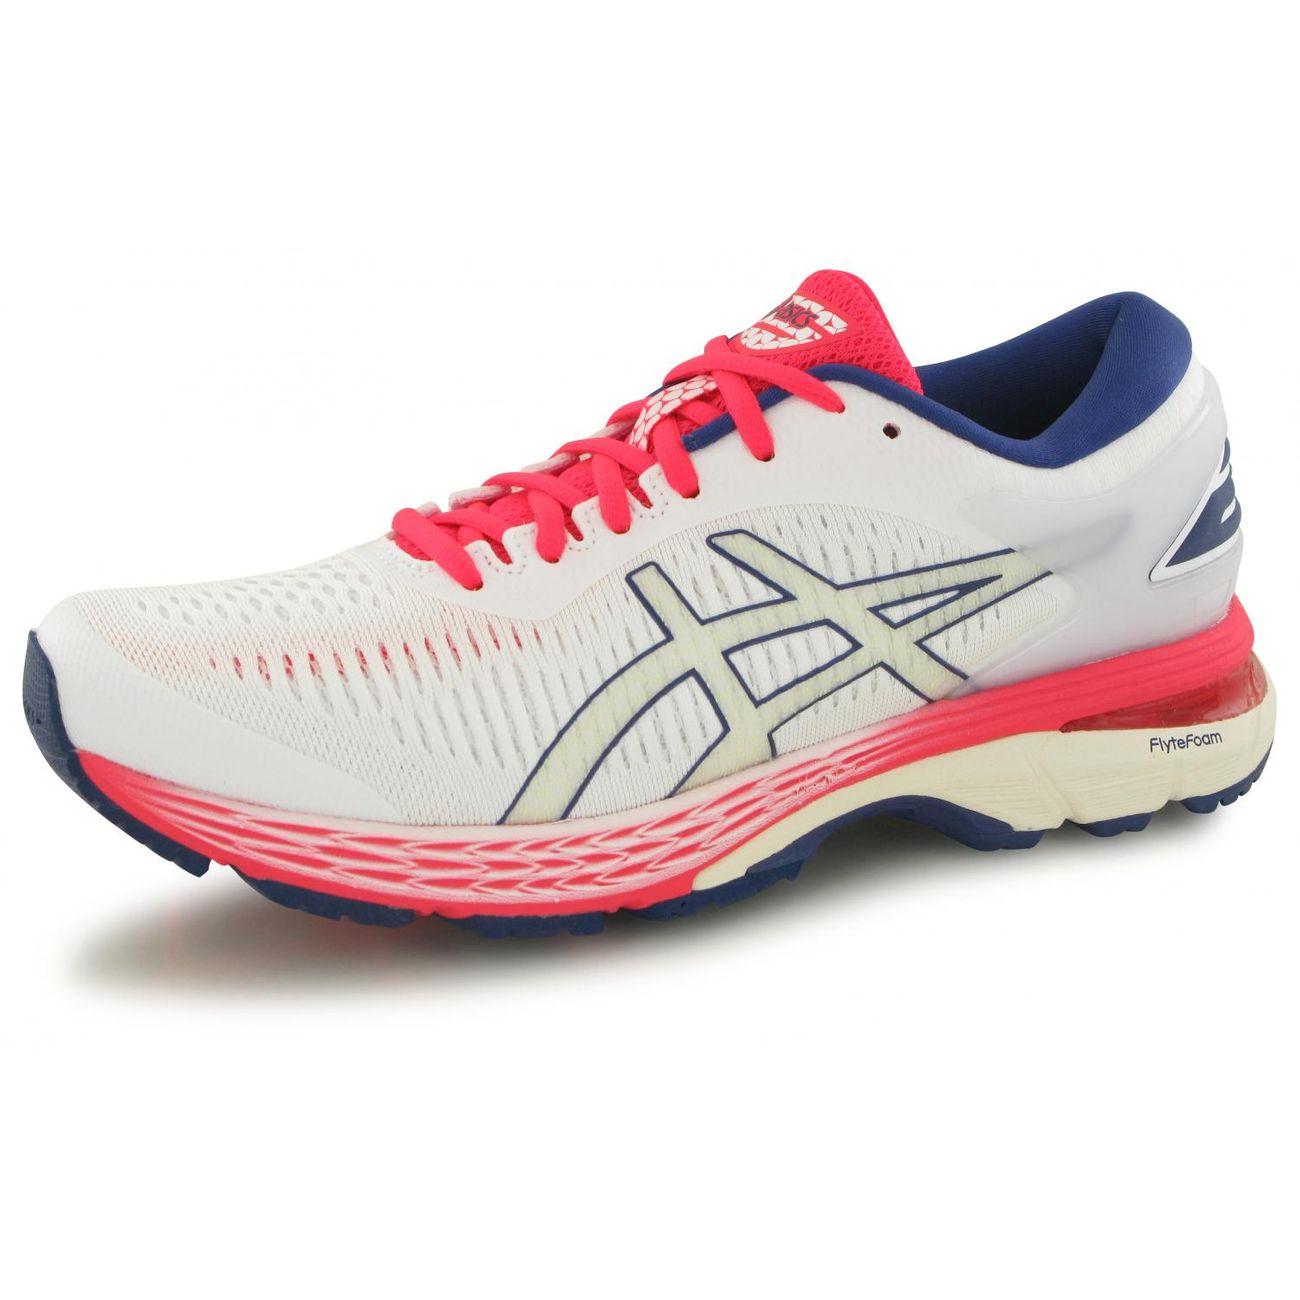 chaussures running femme asics kayano